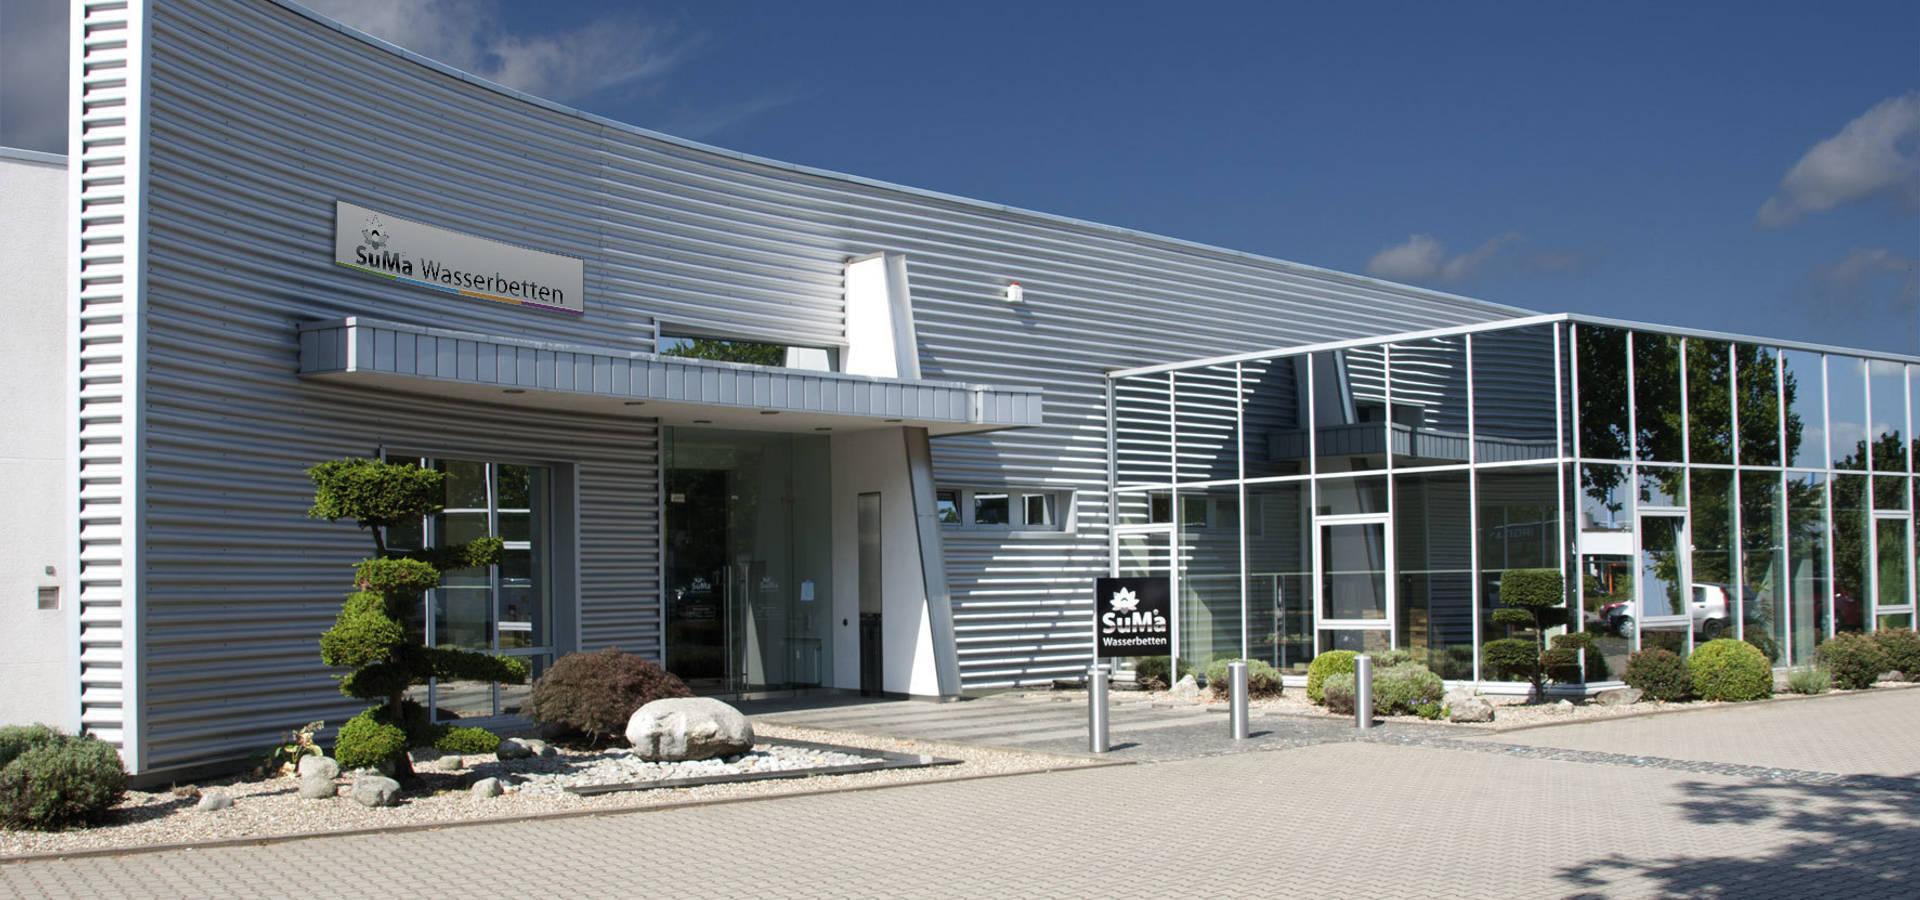 SuMa Wasserbetten GmbH: Möbel & Accessoires in Bocholt | homify